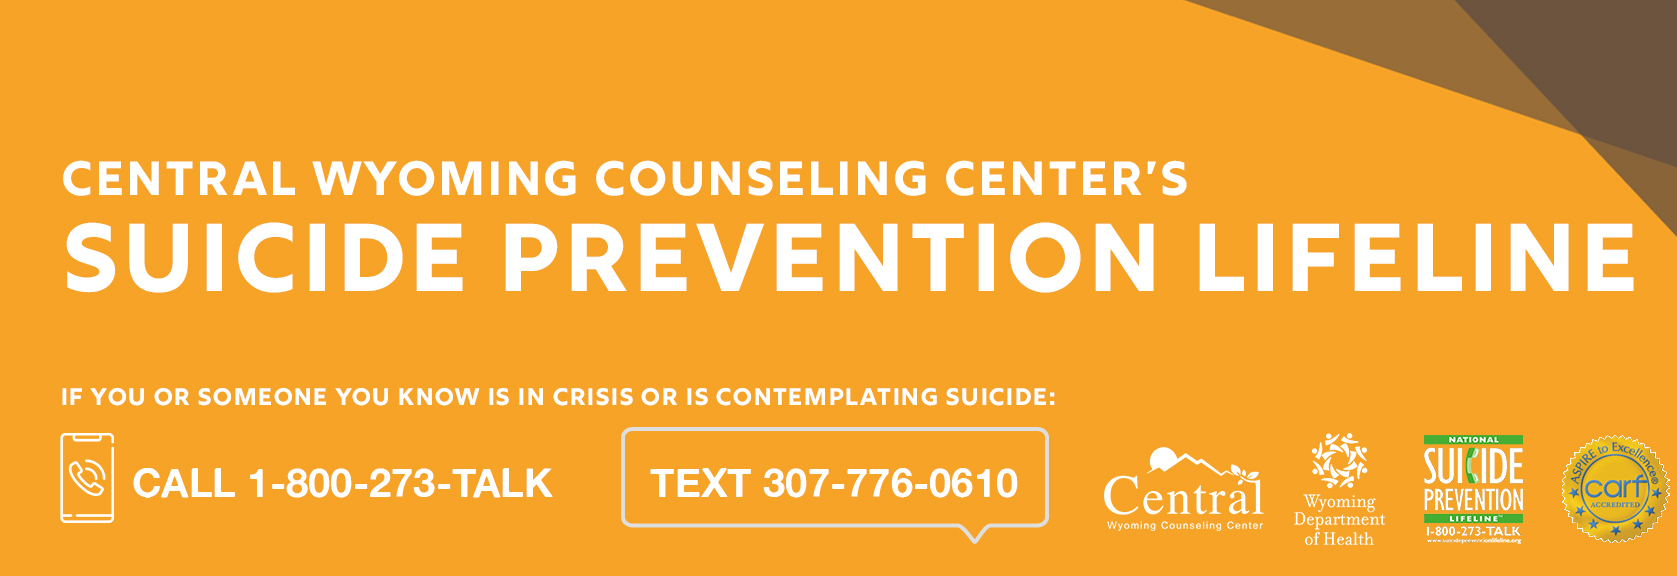 CWCC SUICIDE Lifeline